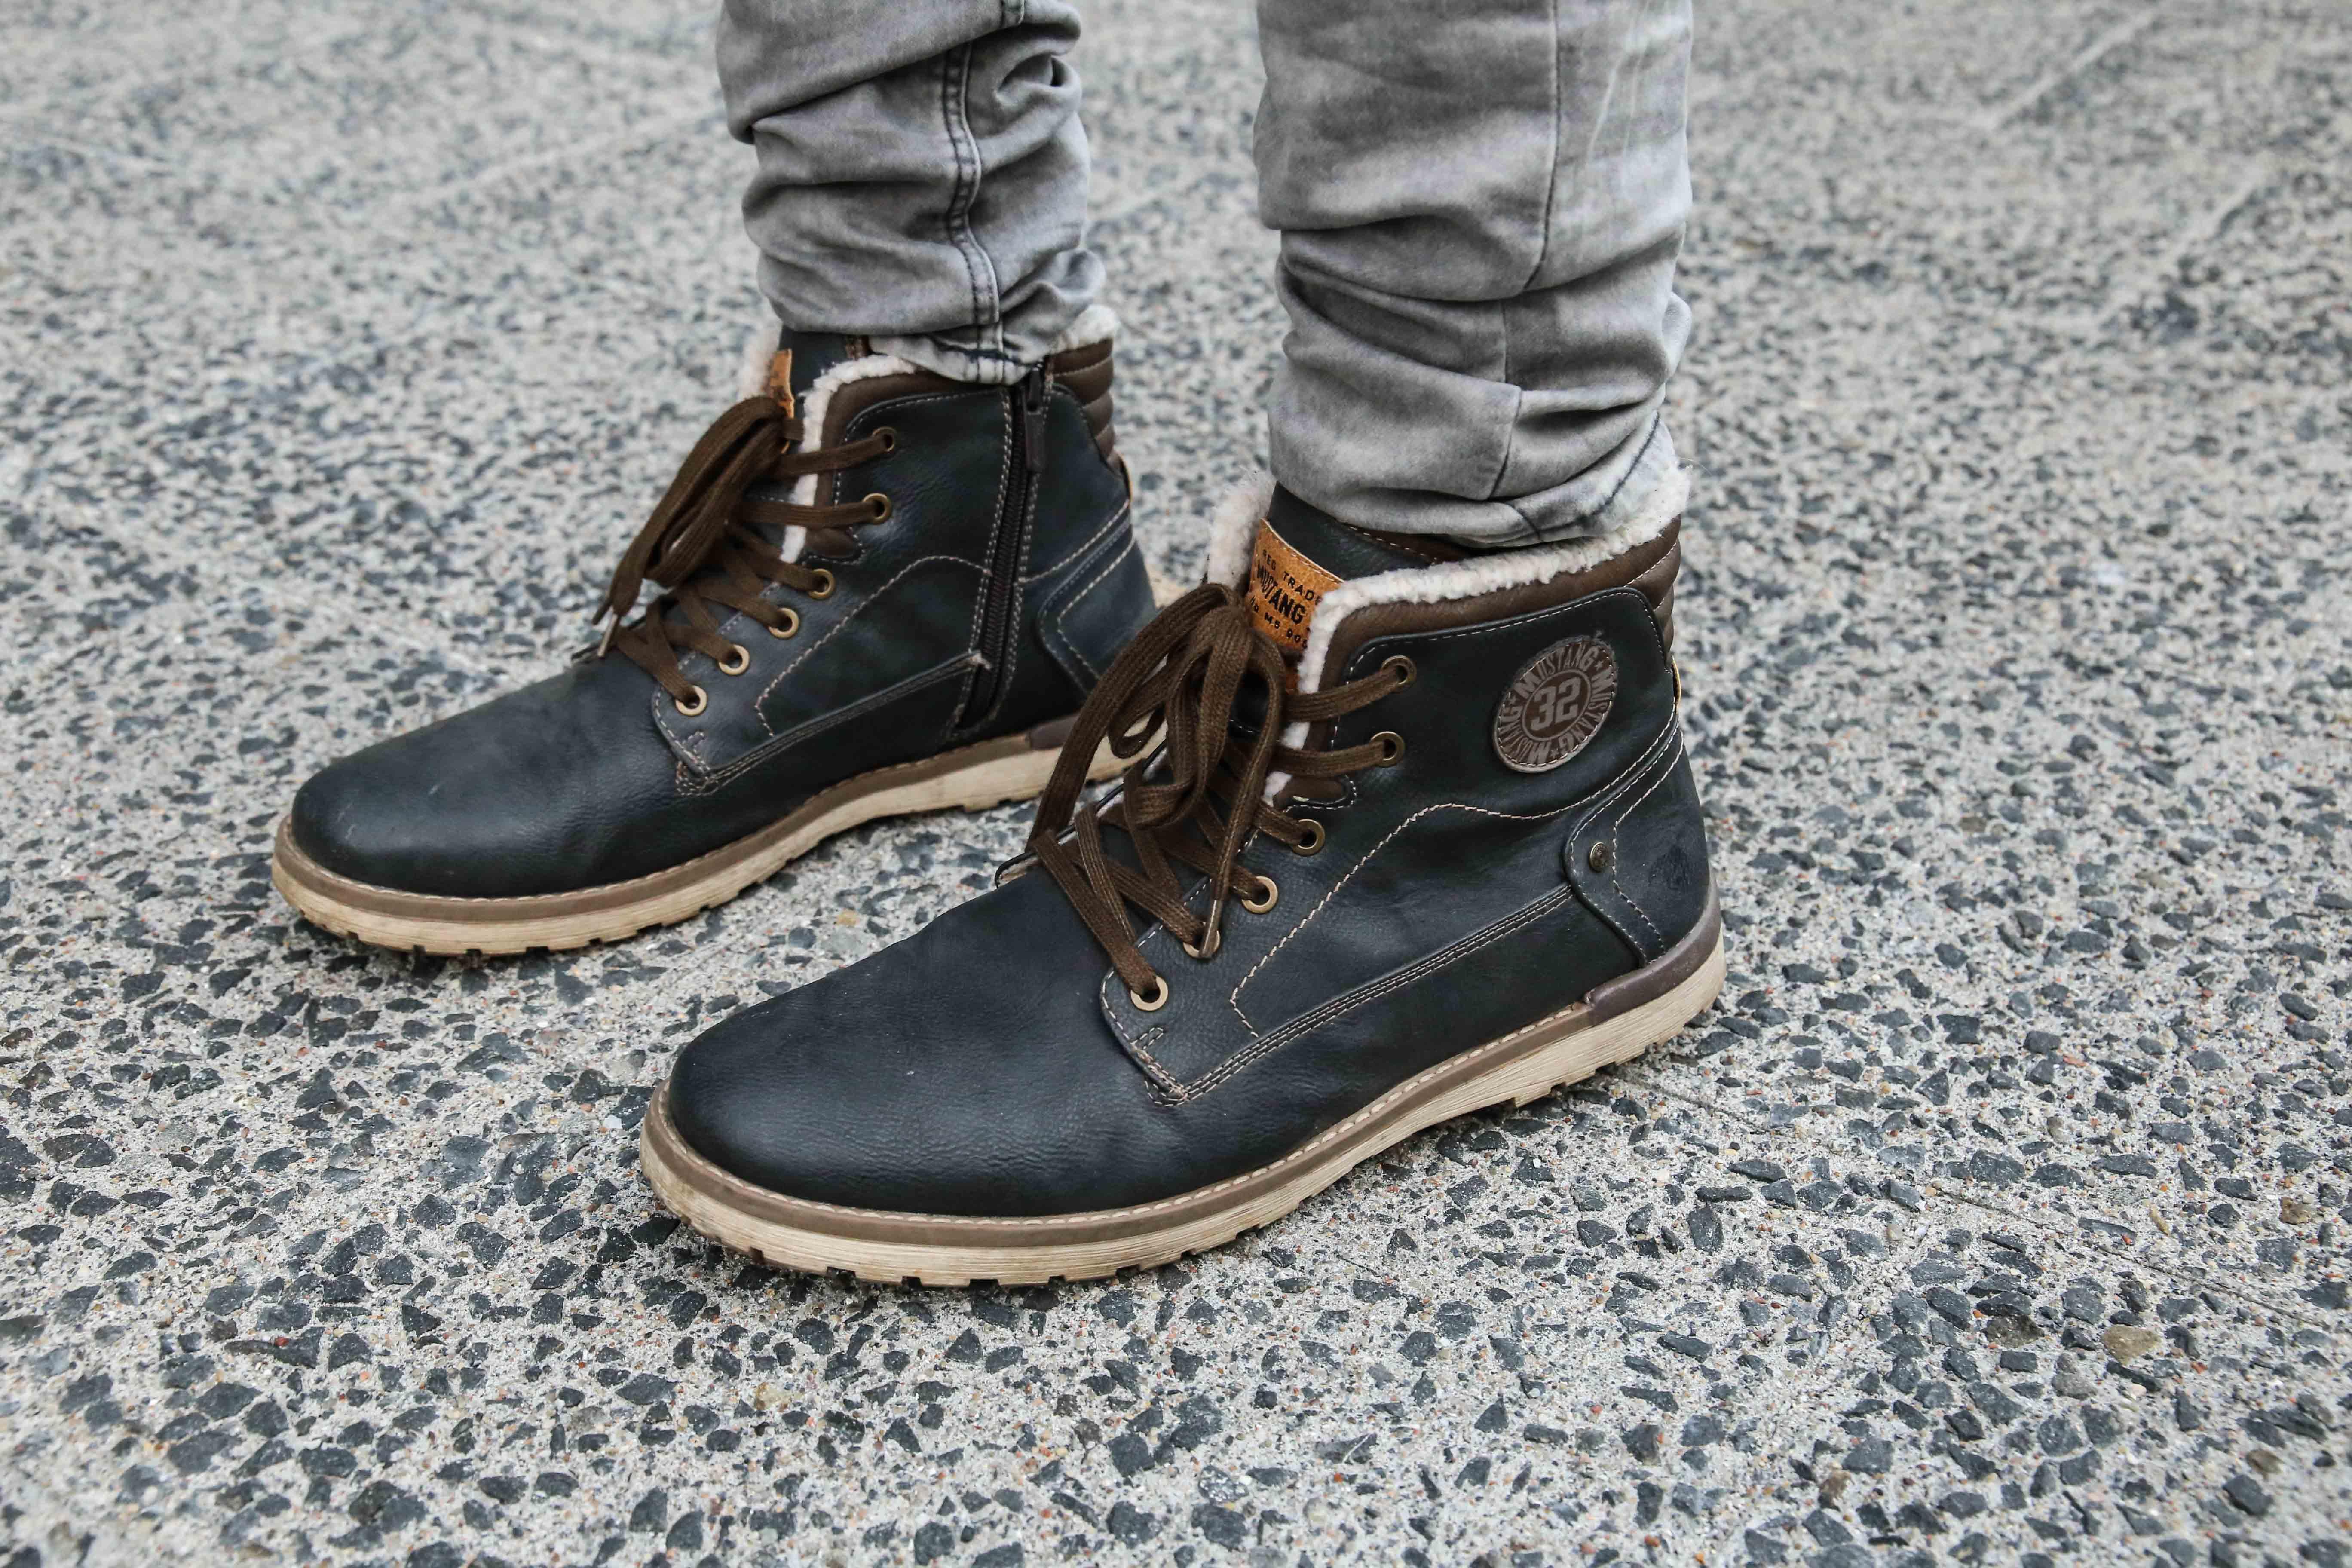 lässiger-herbstlook-graue-jeans-braunes-holzfällerhemd-modeblog-fashionblog-fashion-blogger-berlin_1677